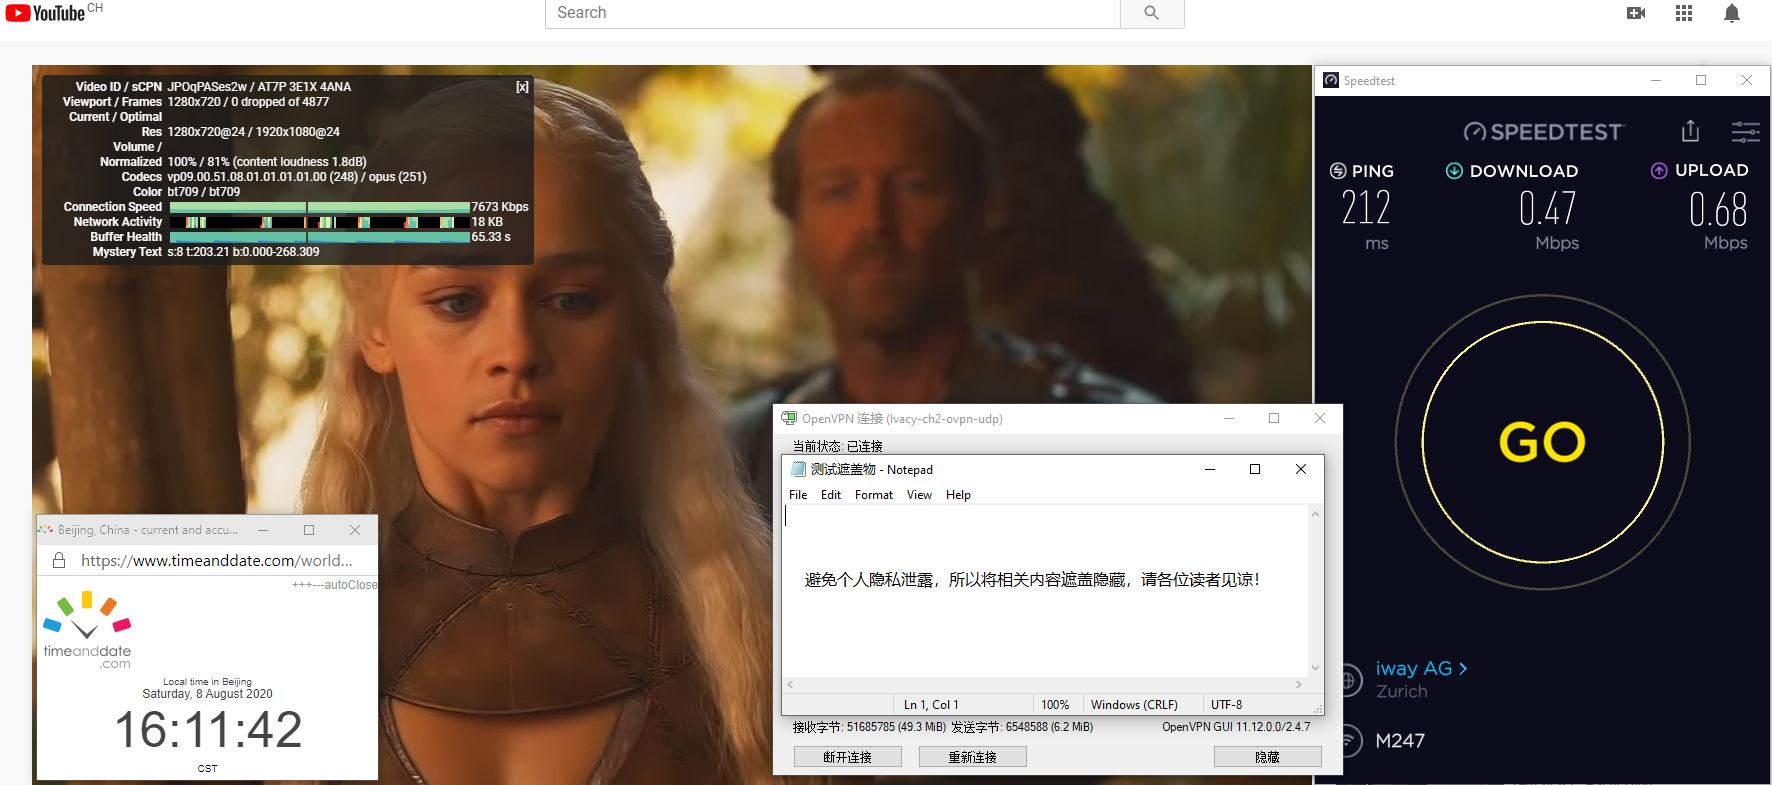 Windows10 IvacyVPN OpenVPN GUI ch2 中国VPN 翻墙 科学上网 翻墙速度测试 - 20200808